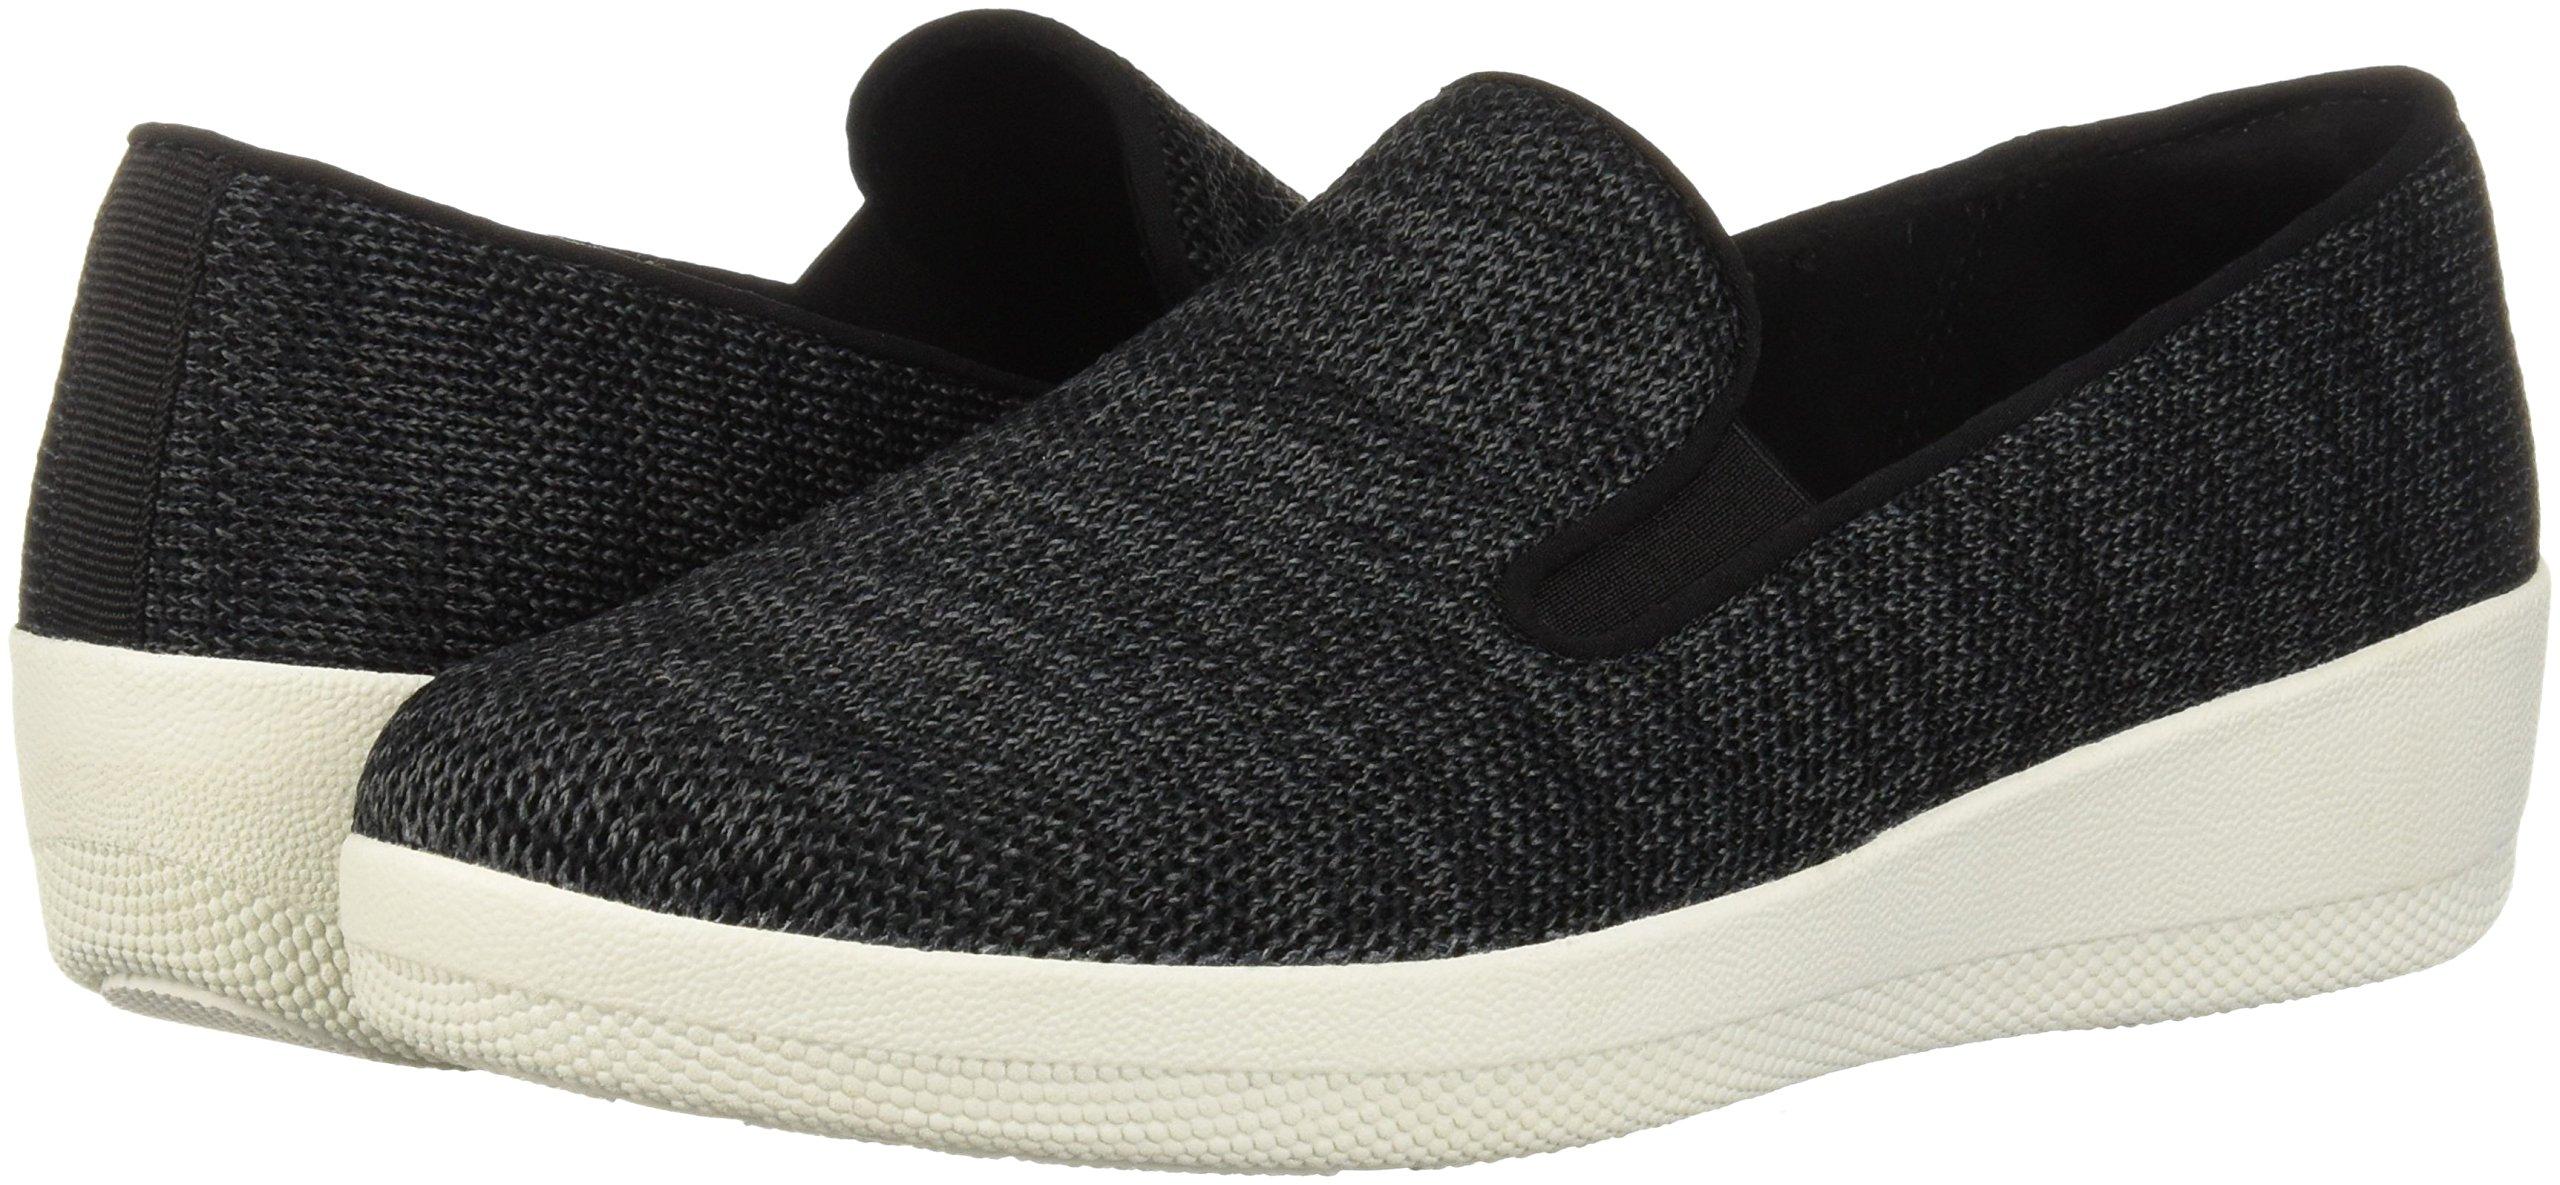 FitFlop Women's Superskate Uberknit Loafers, Black/Soft Grey, 8.5 M US by FitFlop (Image #5)